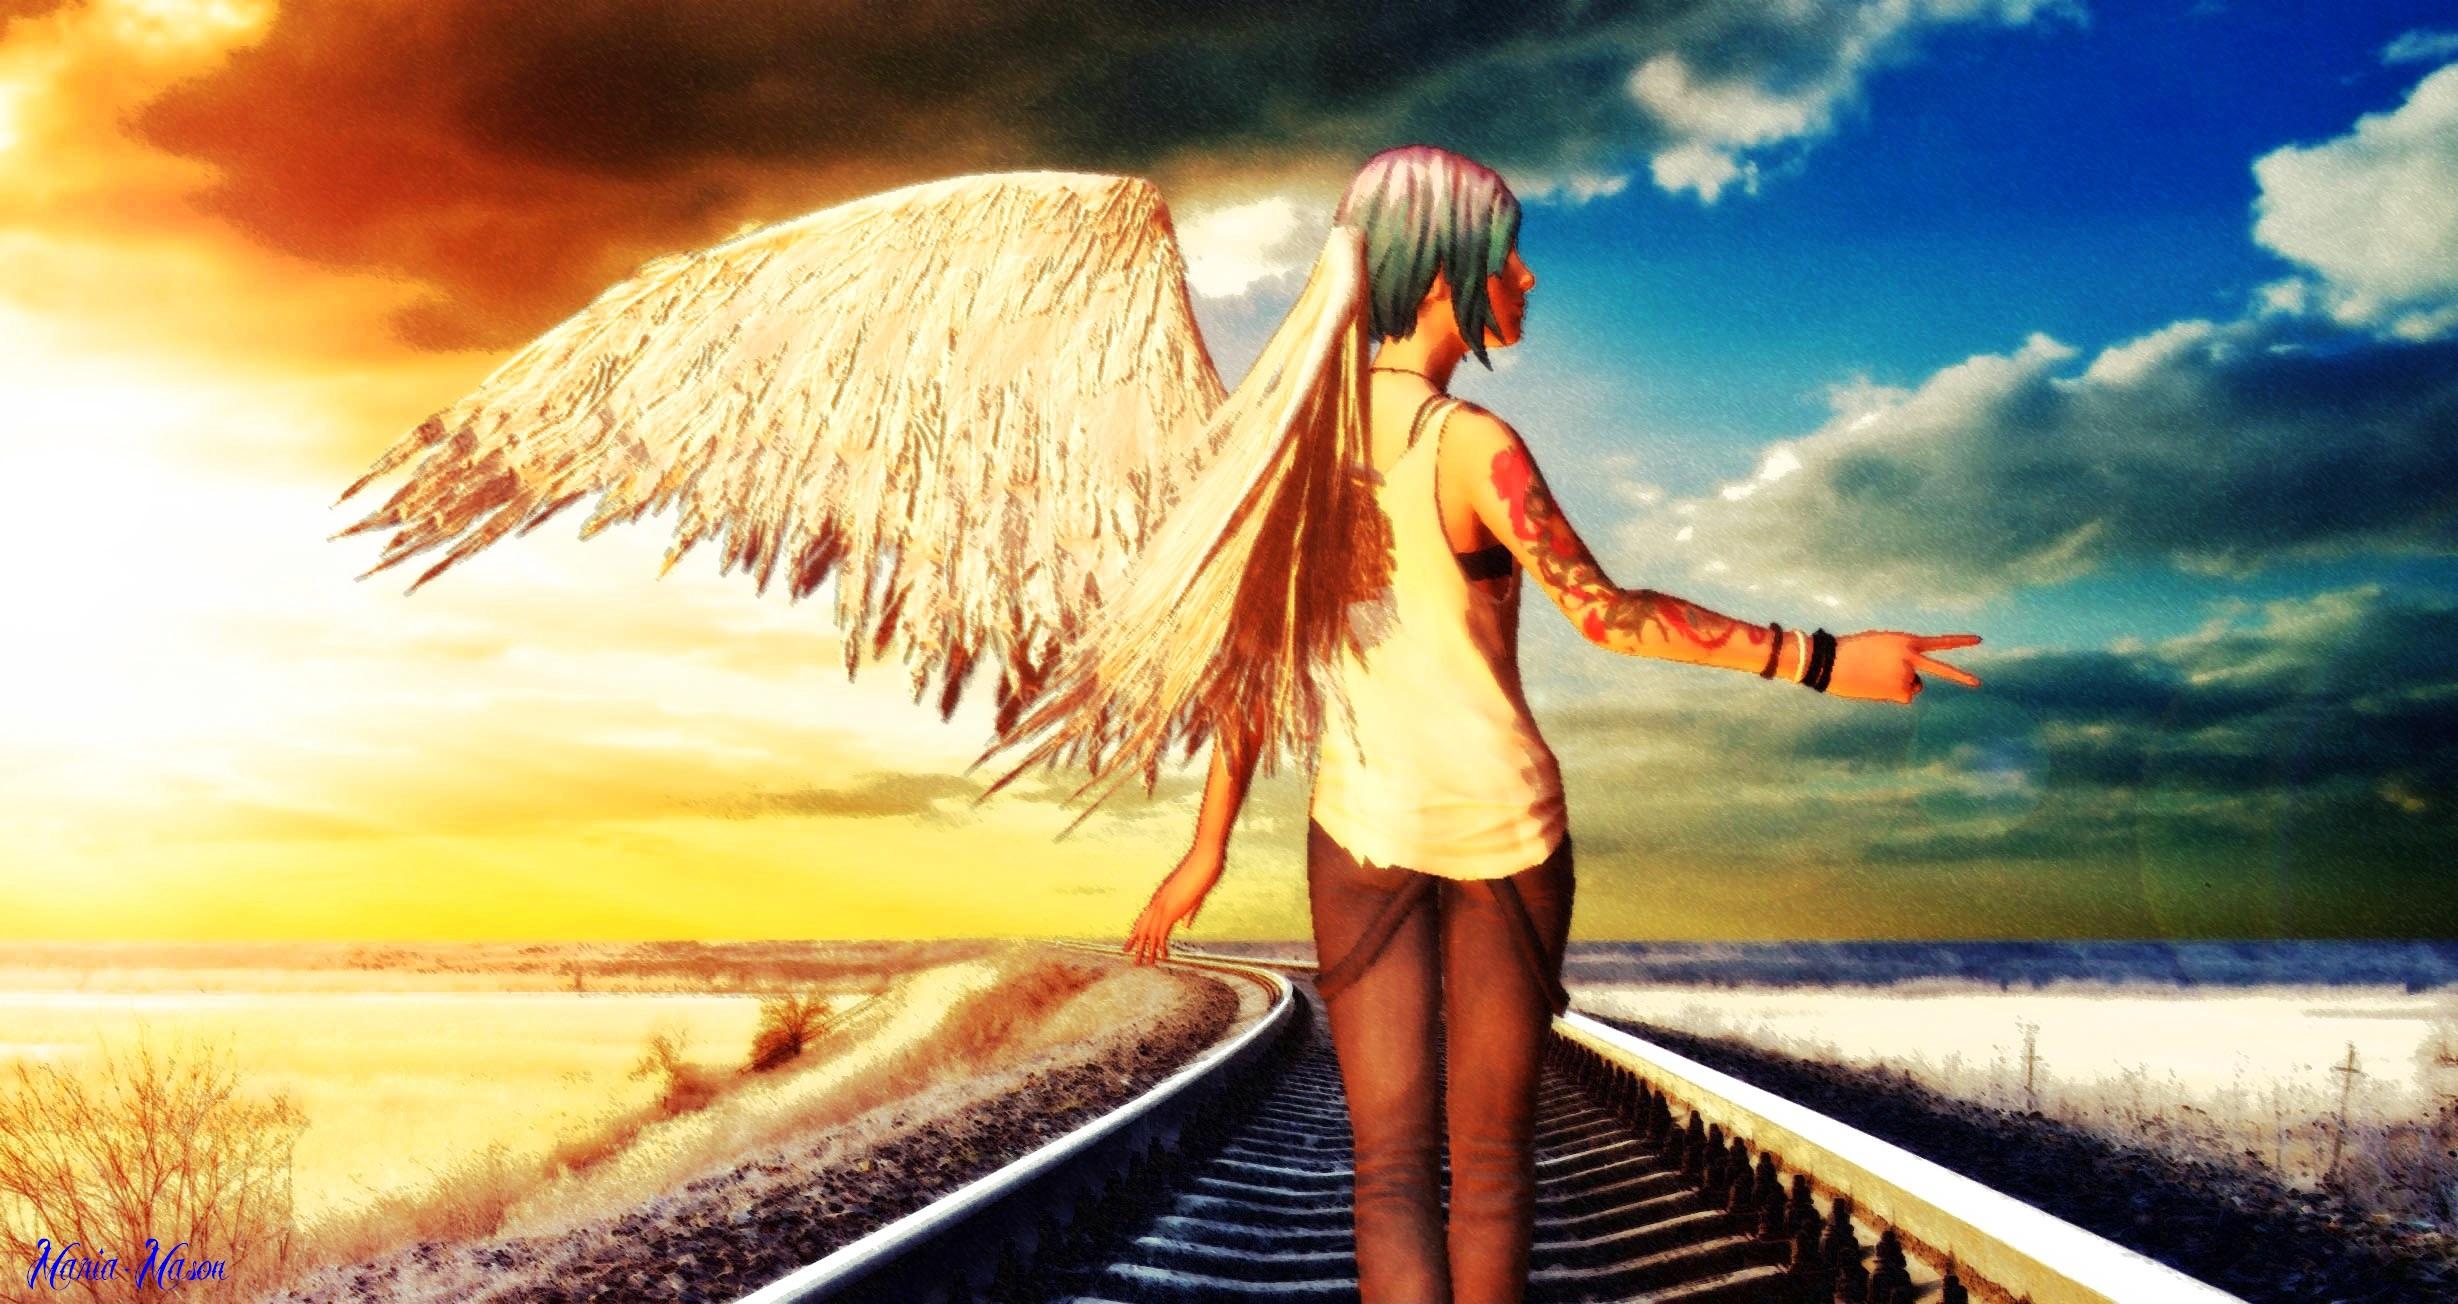 Life is Strange   Chloe Price by Maria Mason 2458x1304